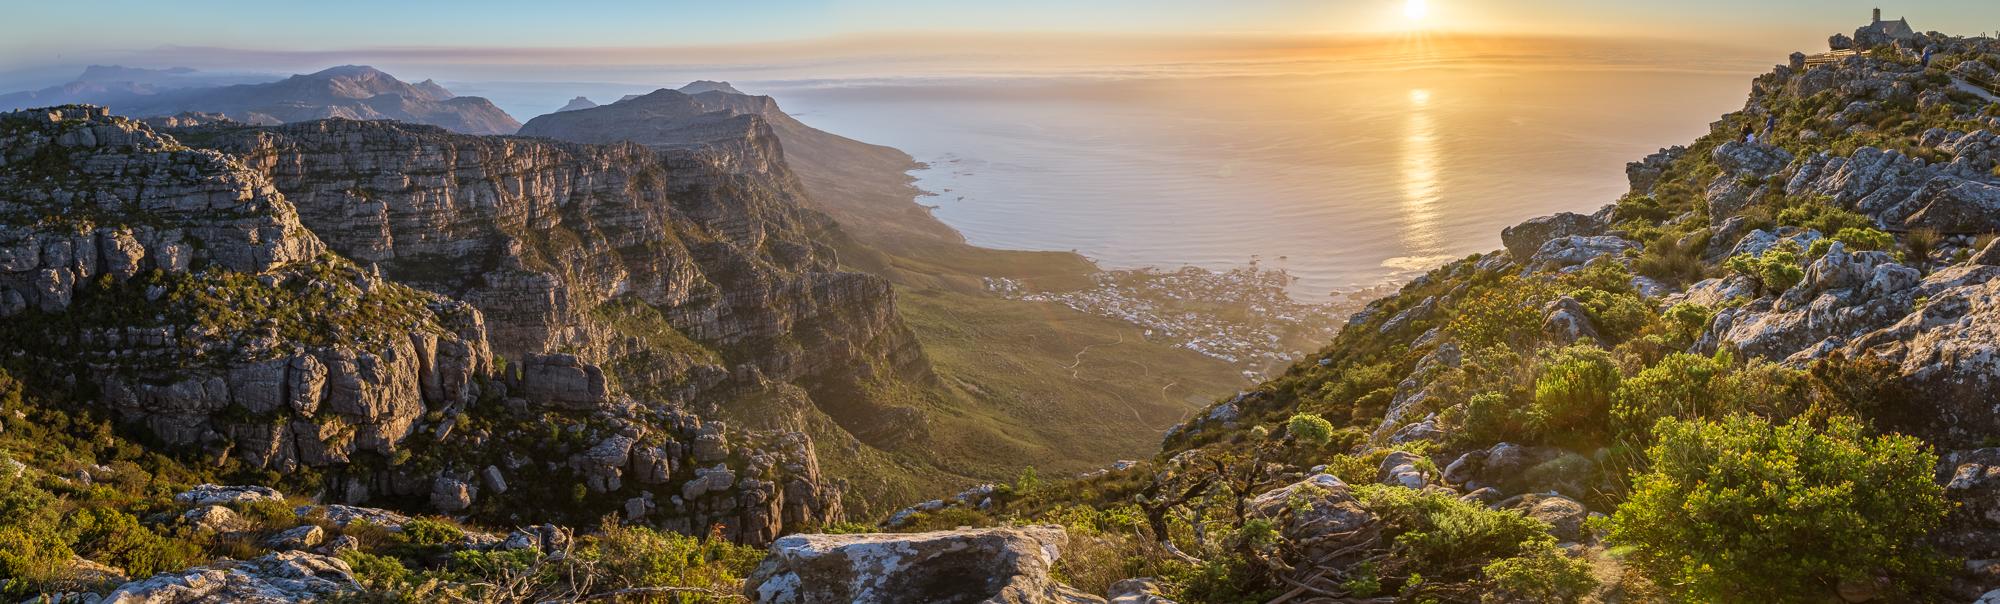 Tafelberg Kapstadt Panorama